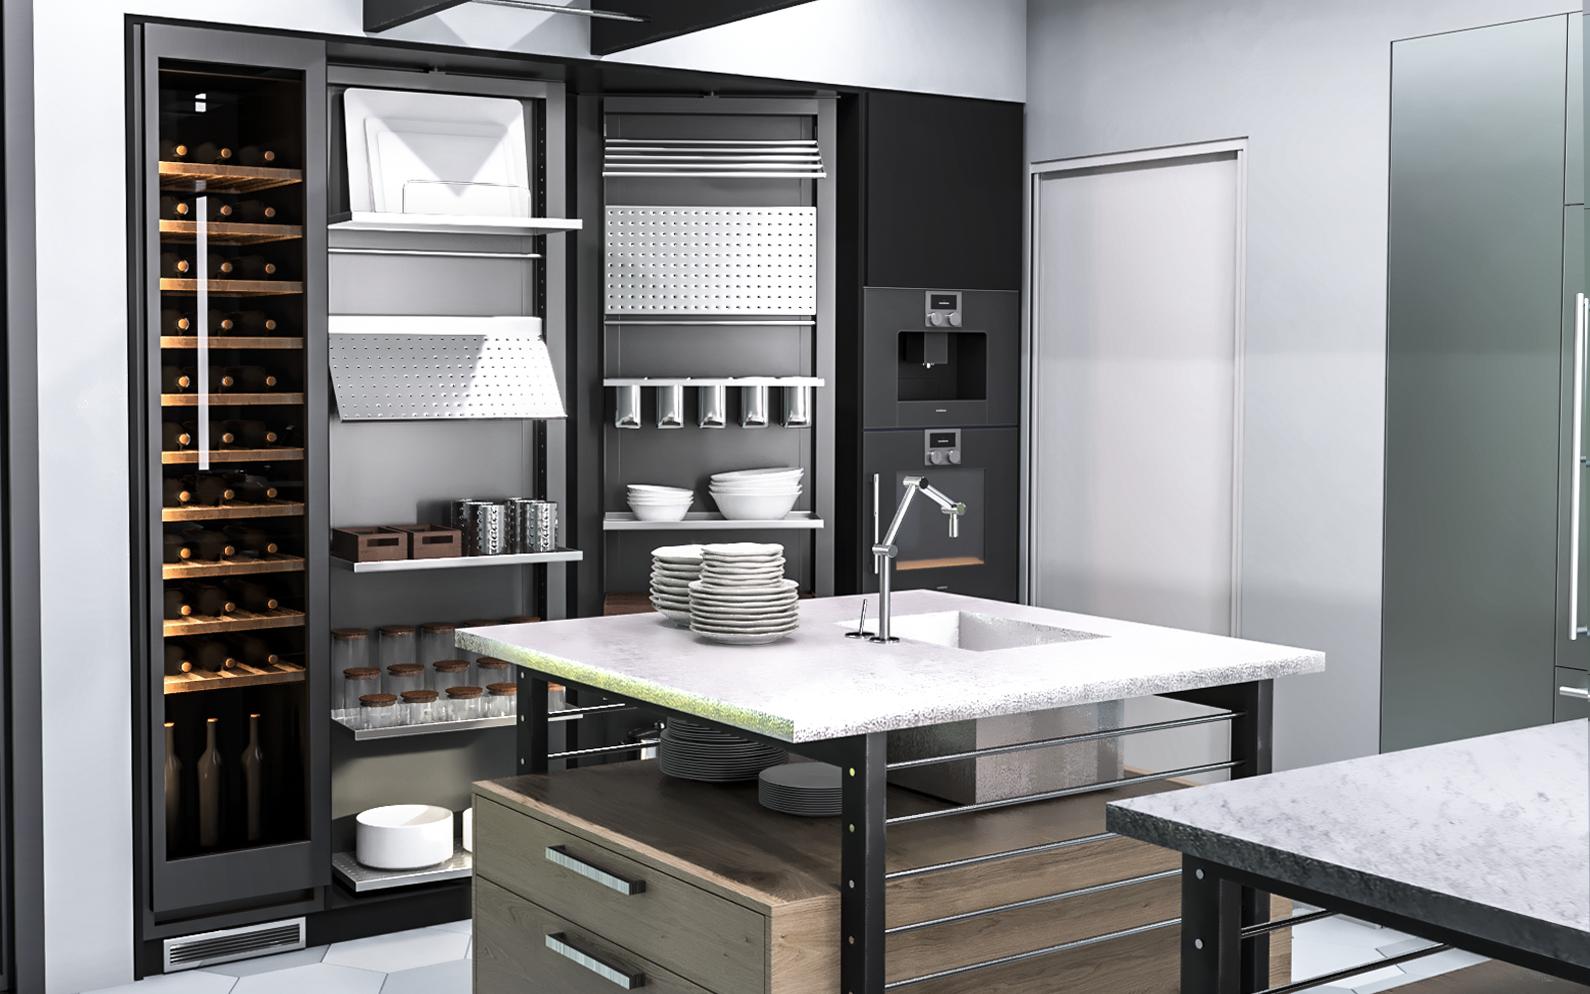 Eggersmann Works Kitchen Visualization in 3d max corona render image